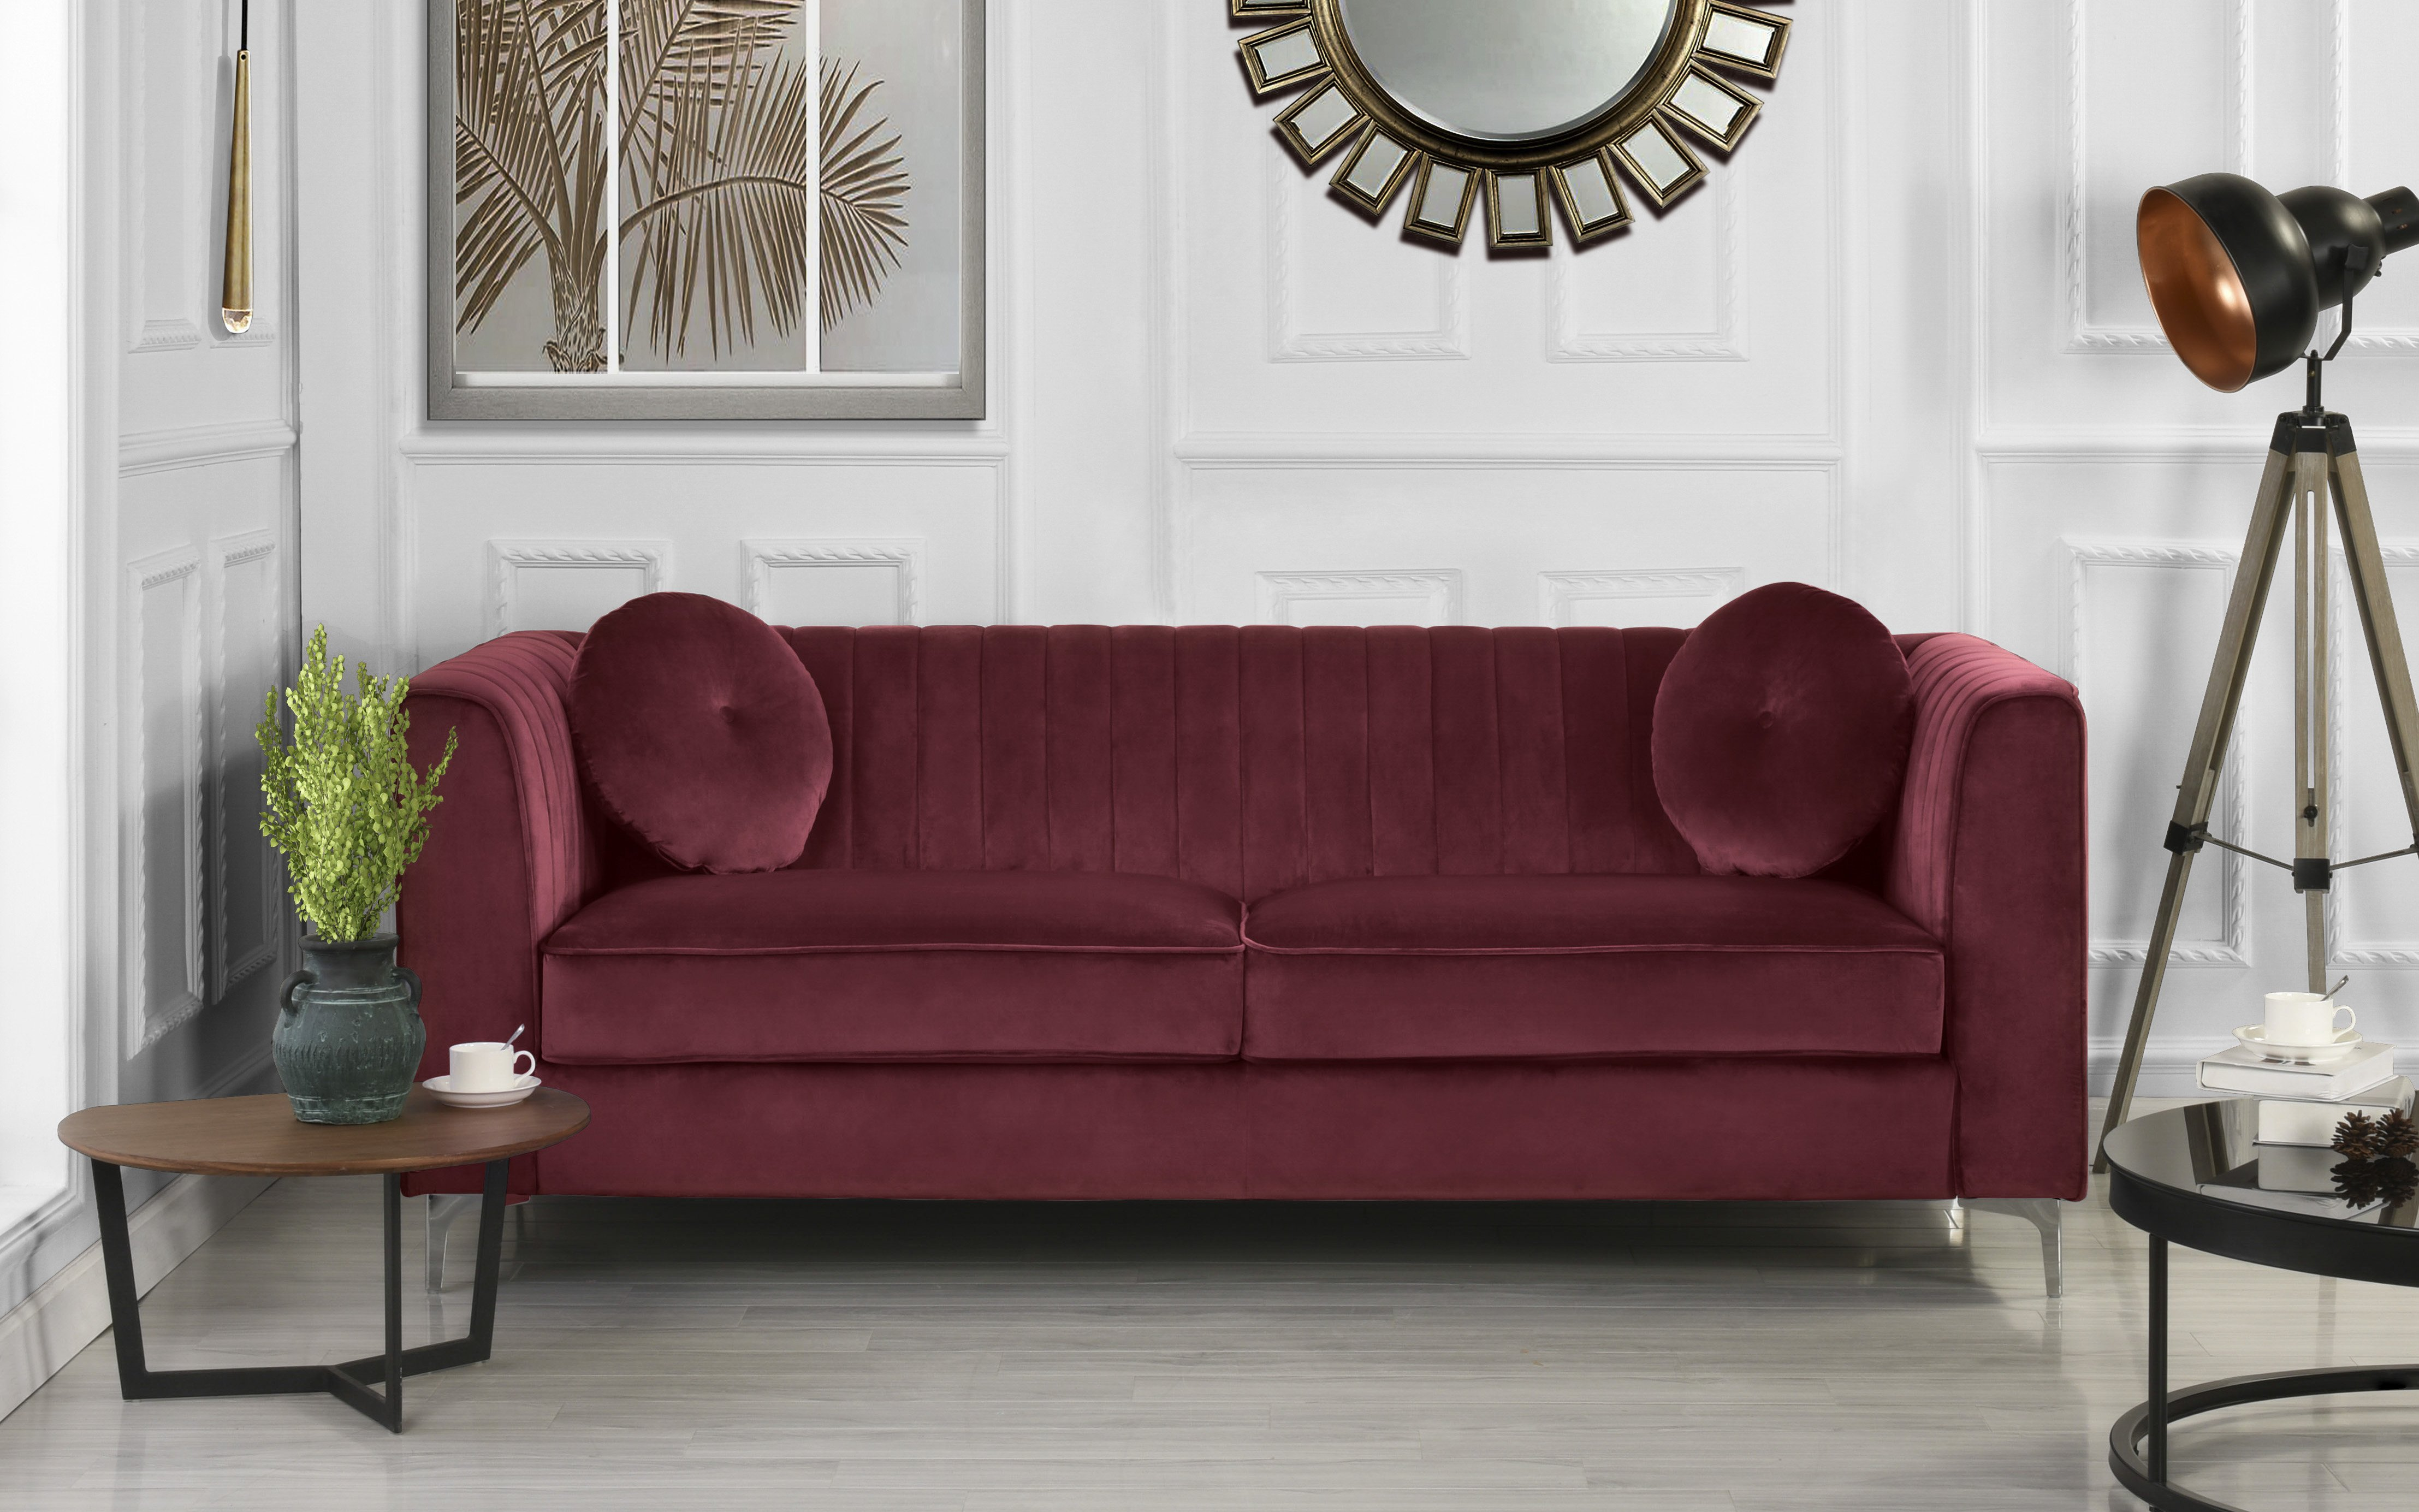 Details about Modern Living Room Sofa Sleek Velvet Frame Pleated High  Density Couch in Red